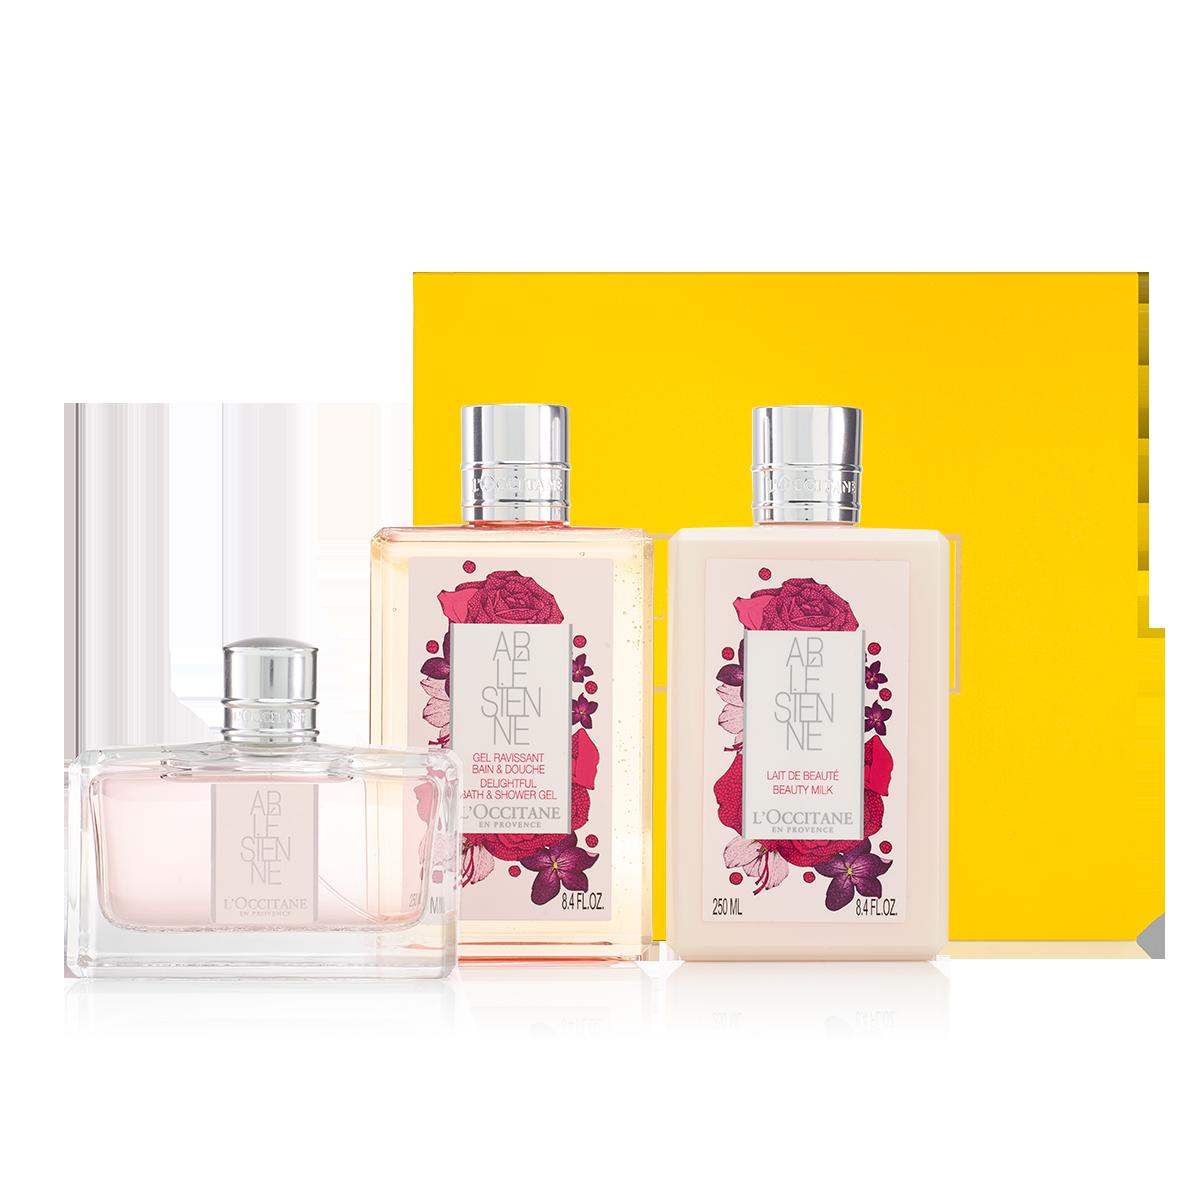 Arlésienne Fragrance Collection - L'Occitane